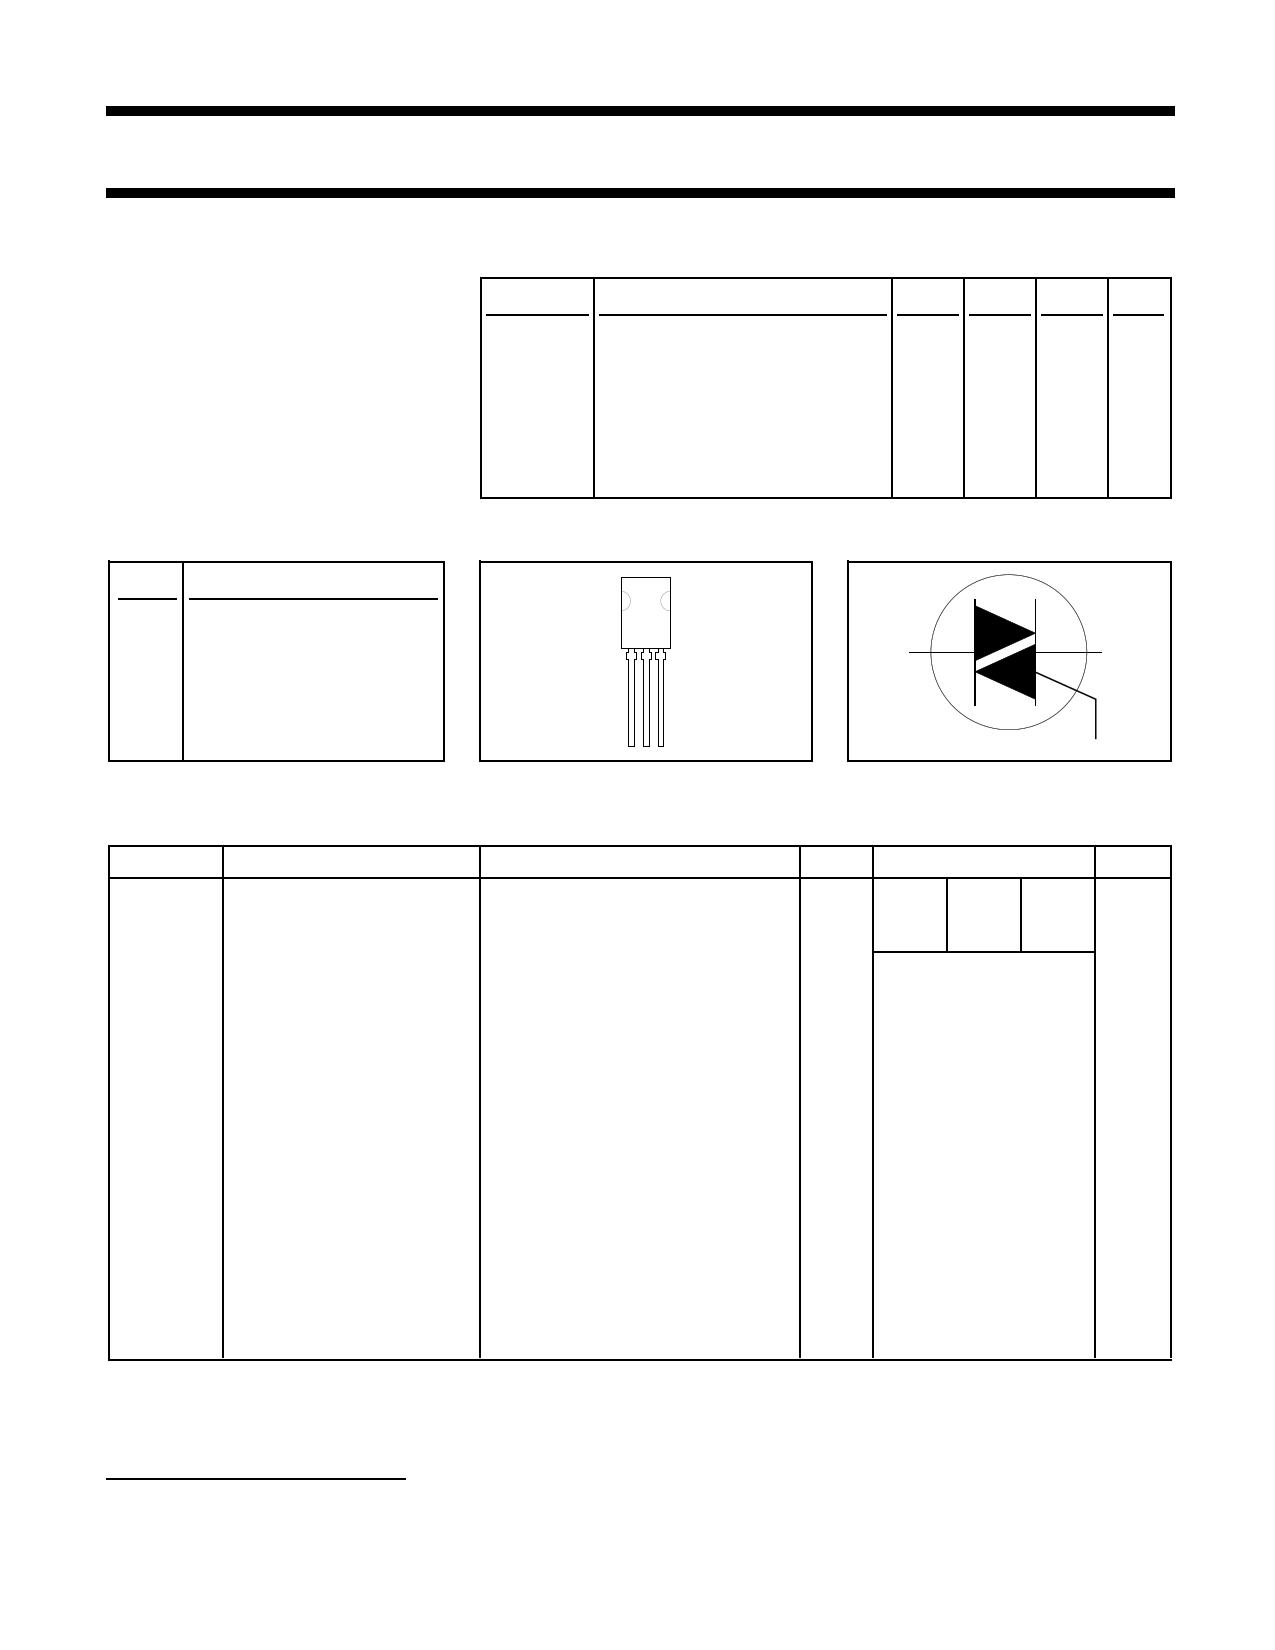 BT134-500 دیتاشیت PDF